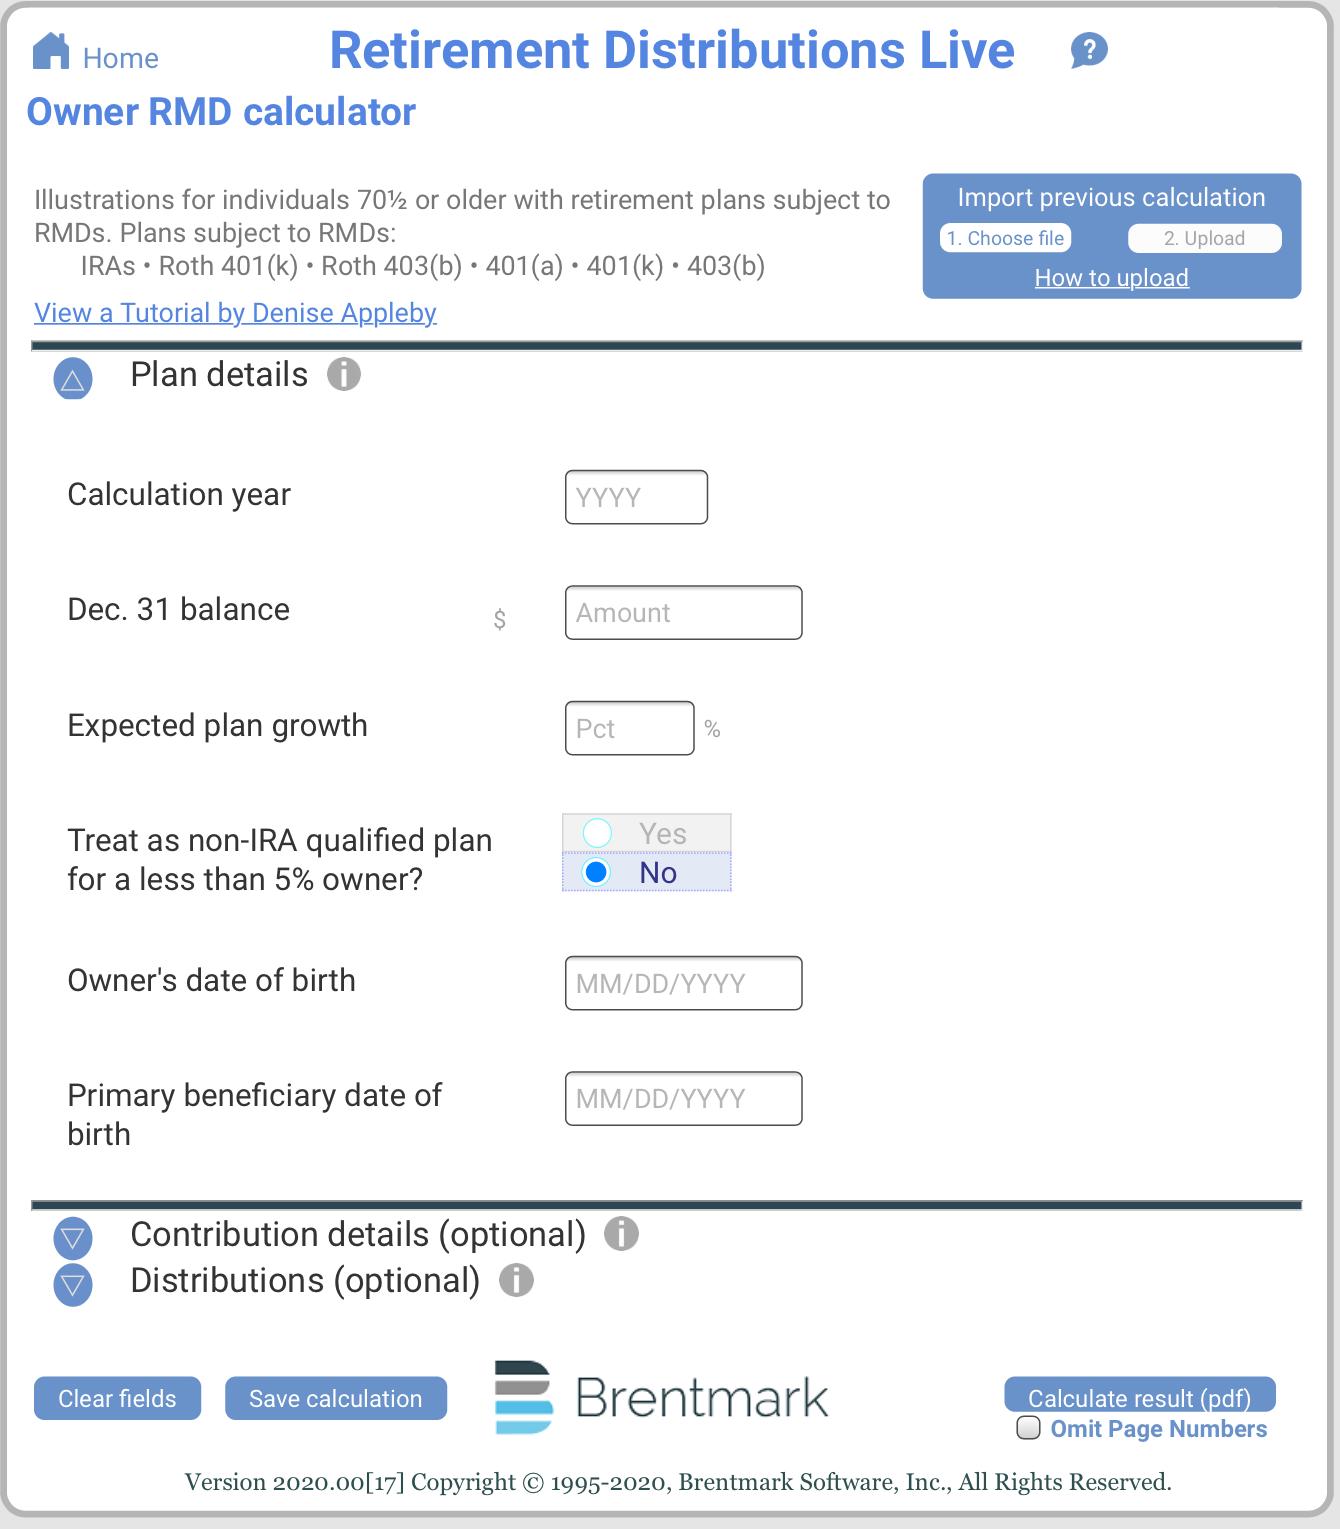 Owner RMD Calculator